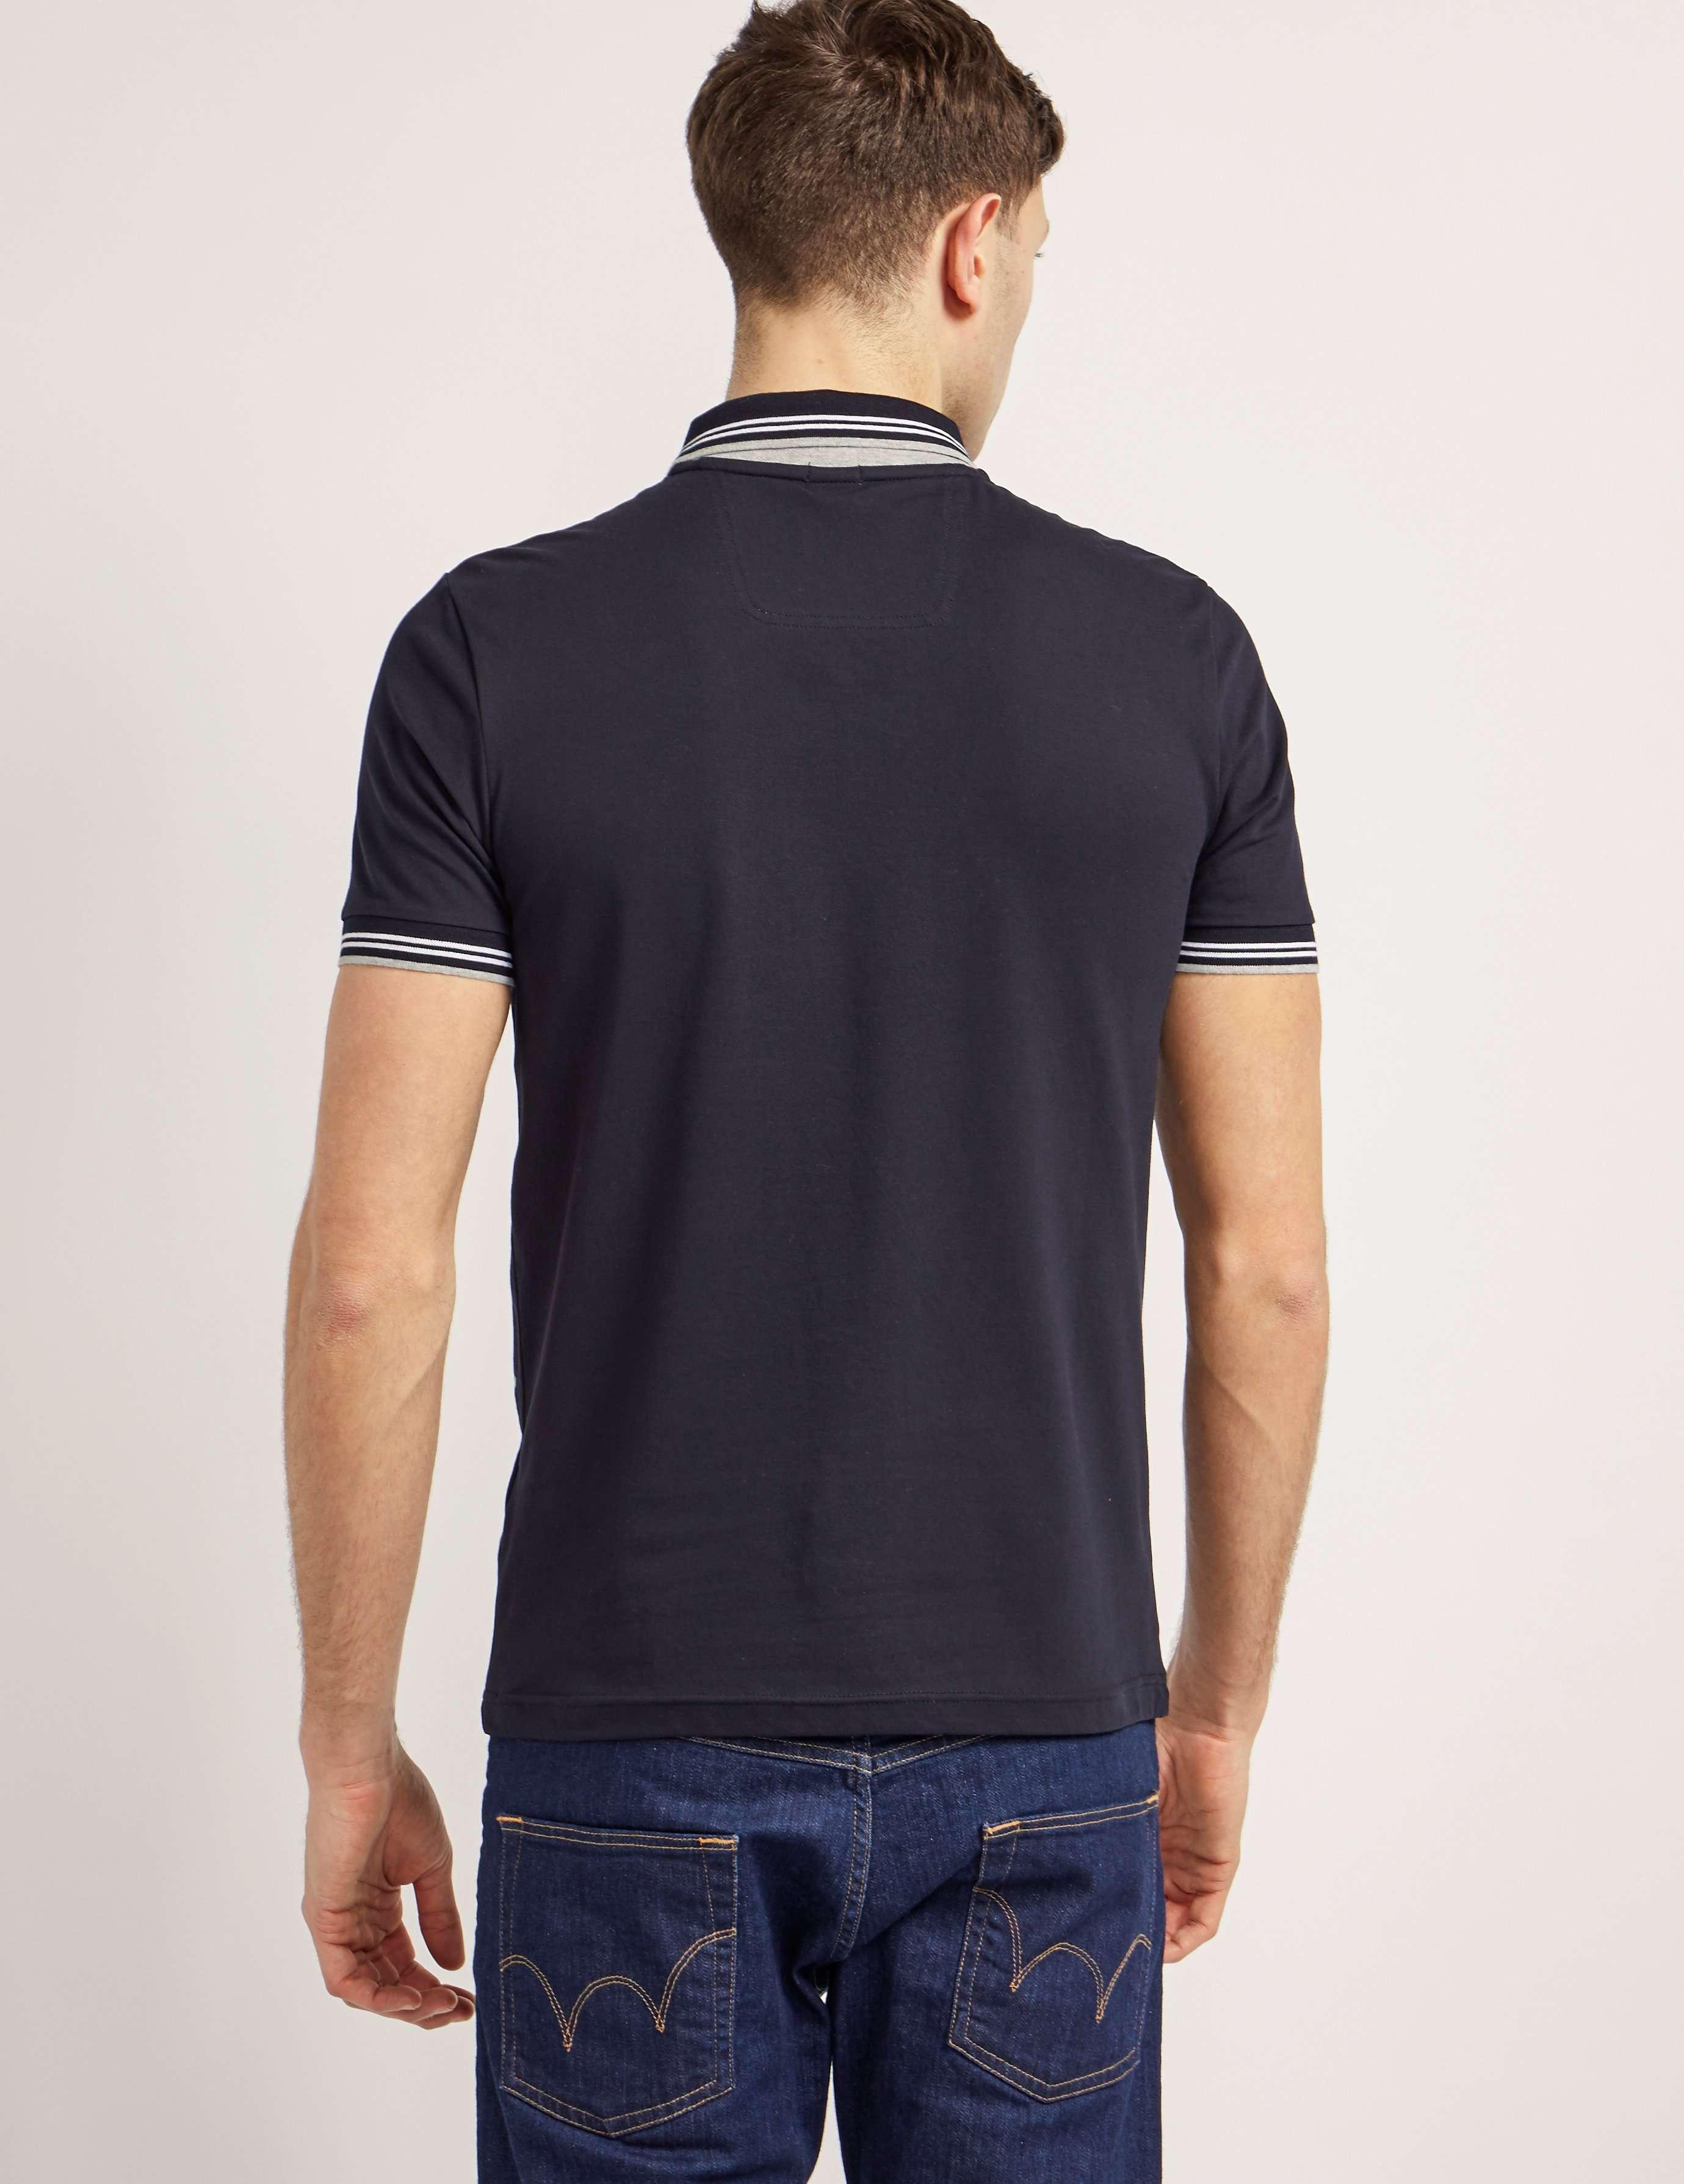 BOSS Green Tipped Short Sleeve Polo Shirt